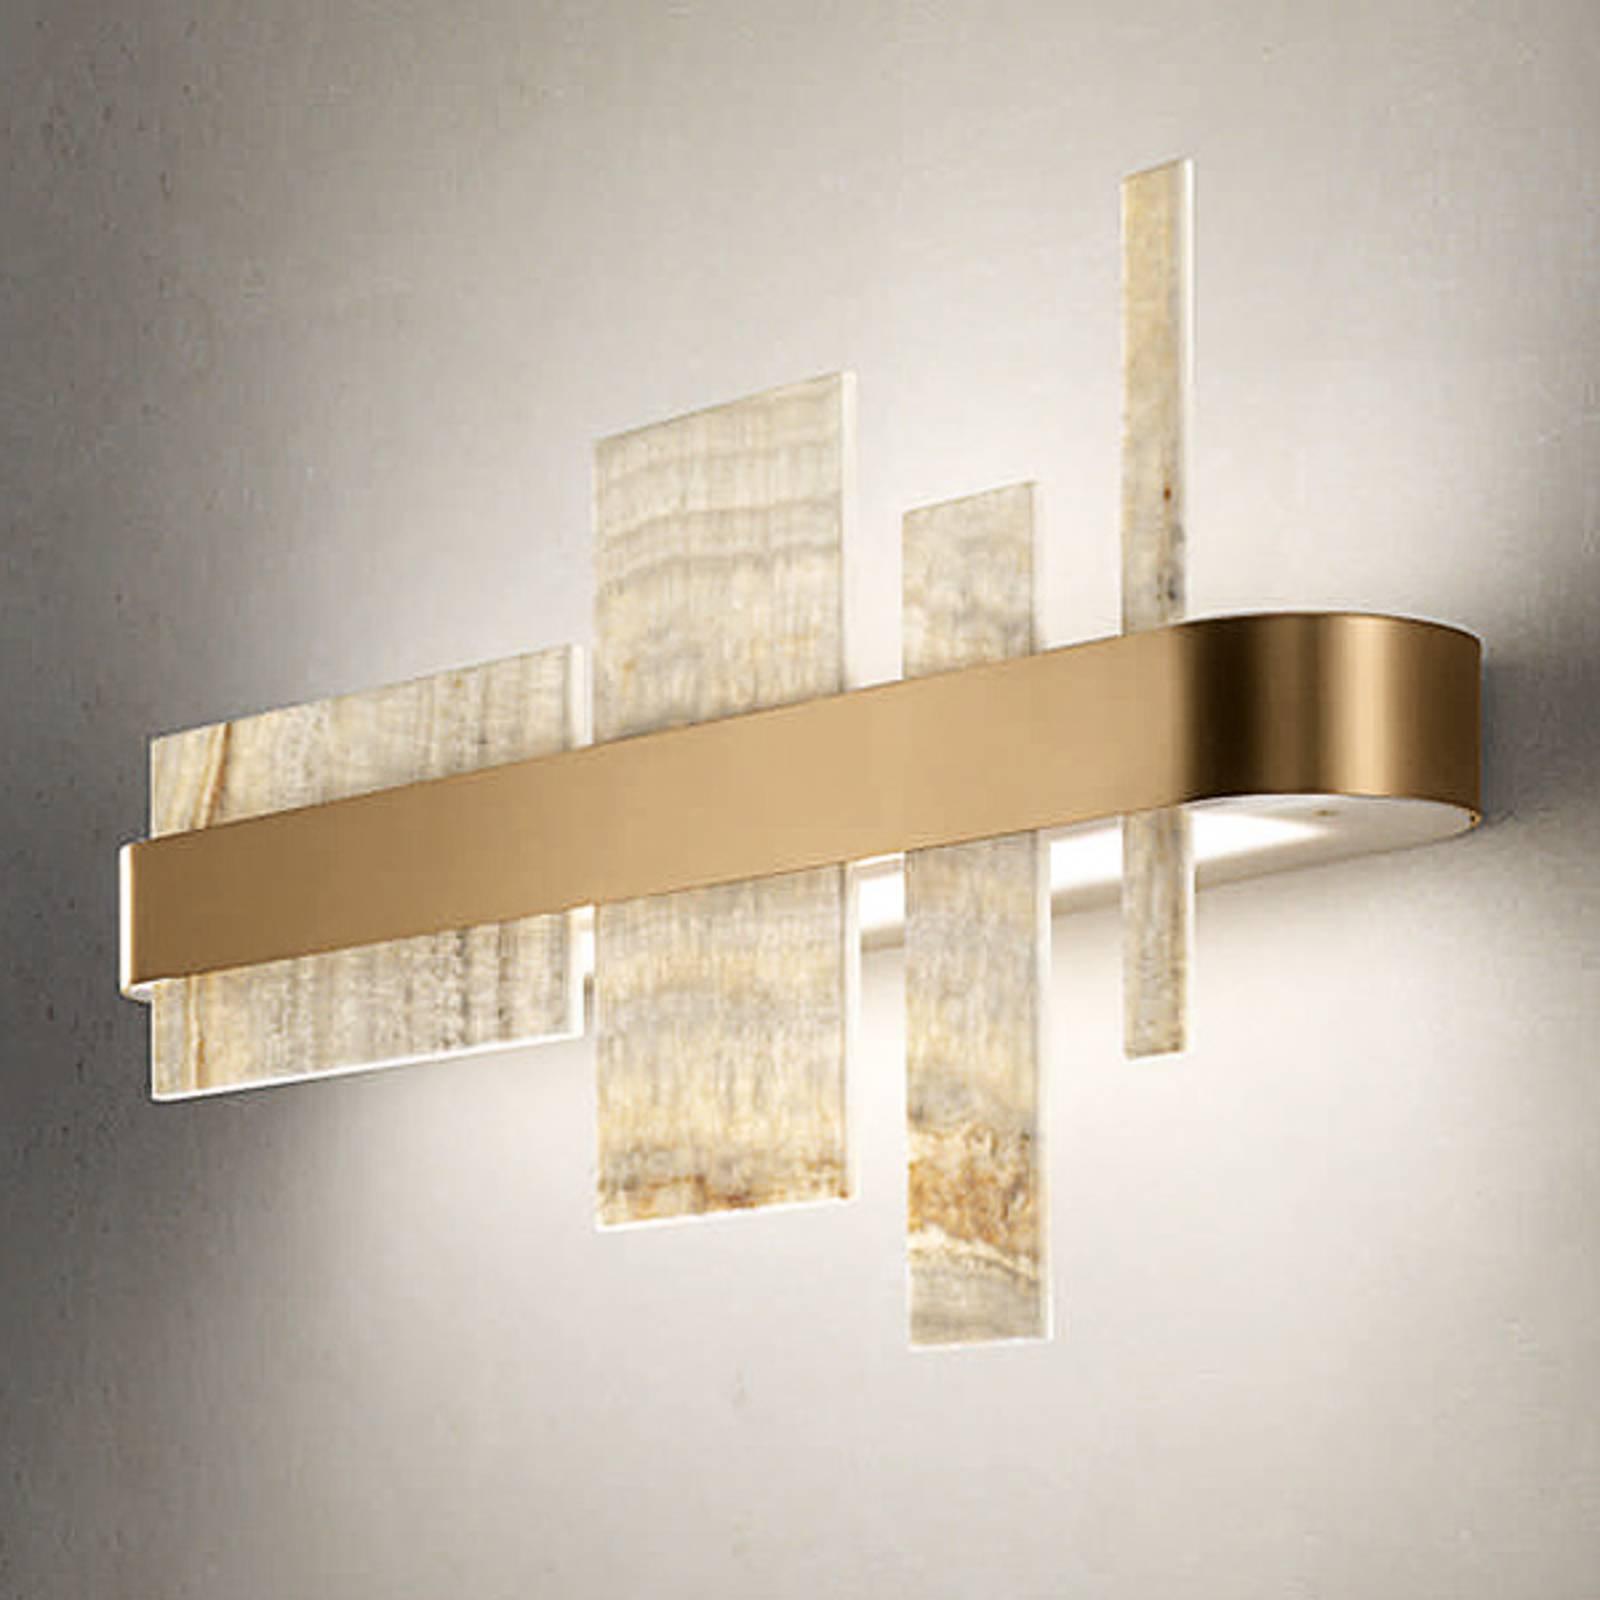 Design-seinävalaisin Honicé LED-valoilla, 65 cm